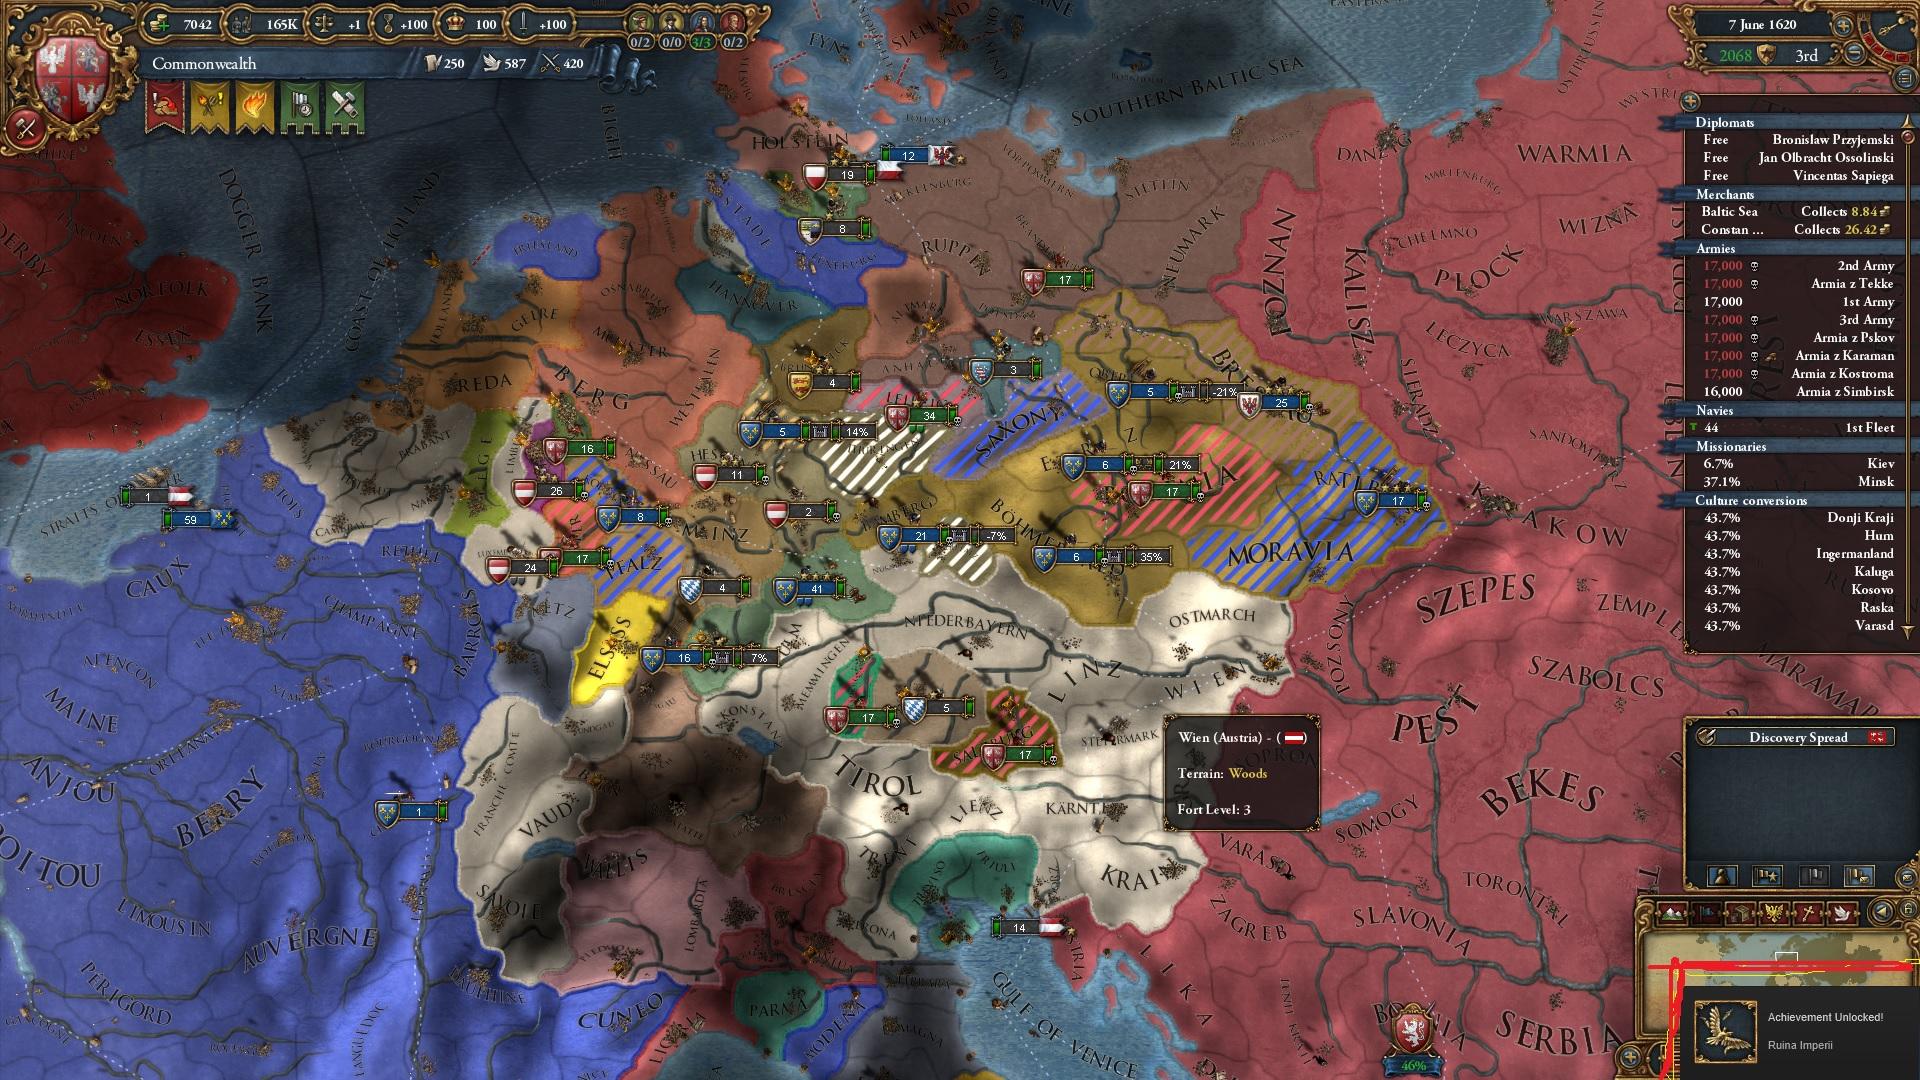 Steam Community :: Guide :: Guarantor of Peace + Ruina Imperii + One